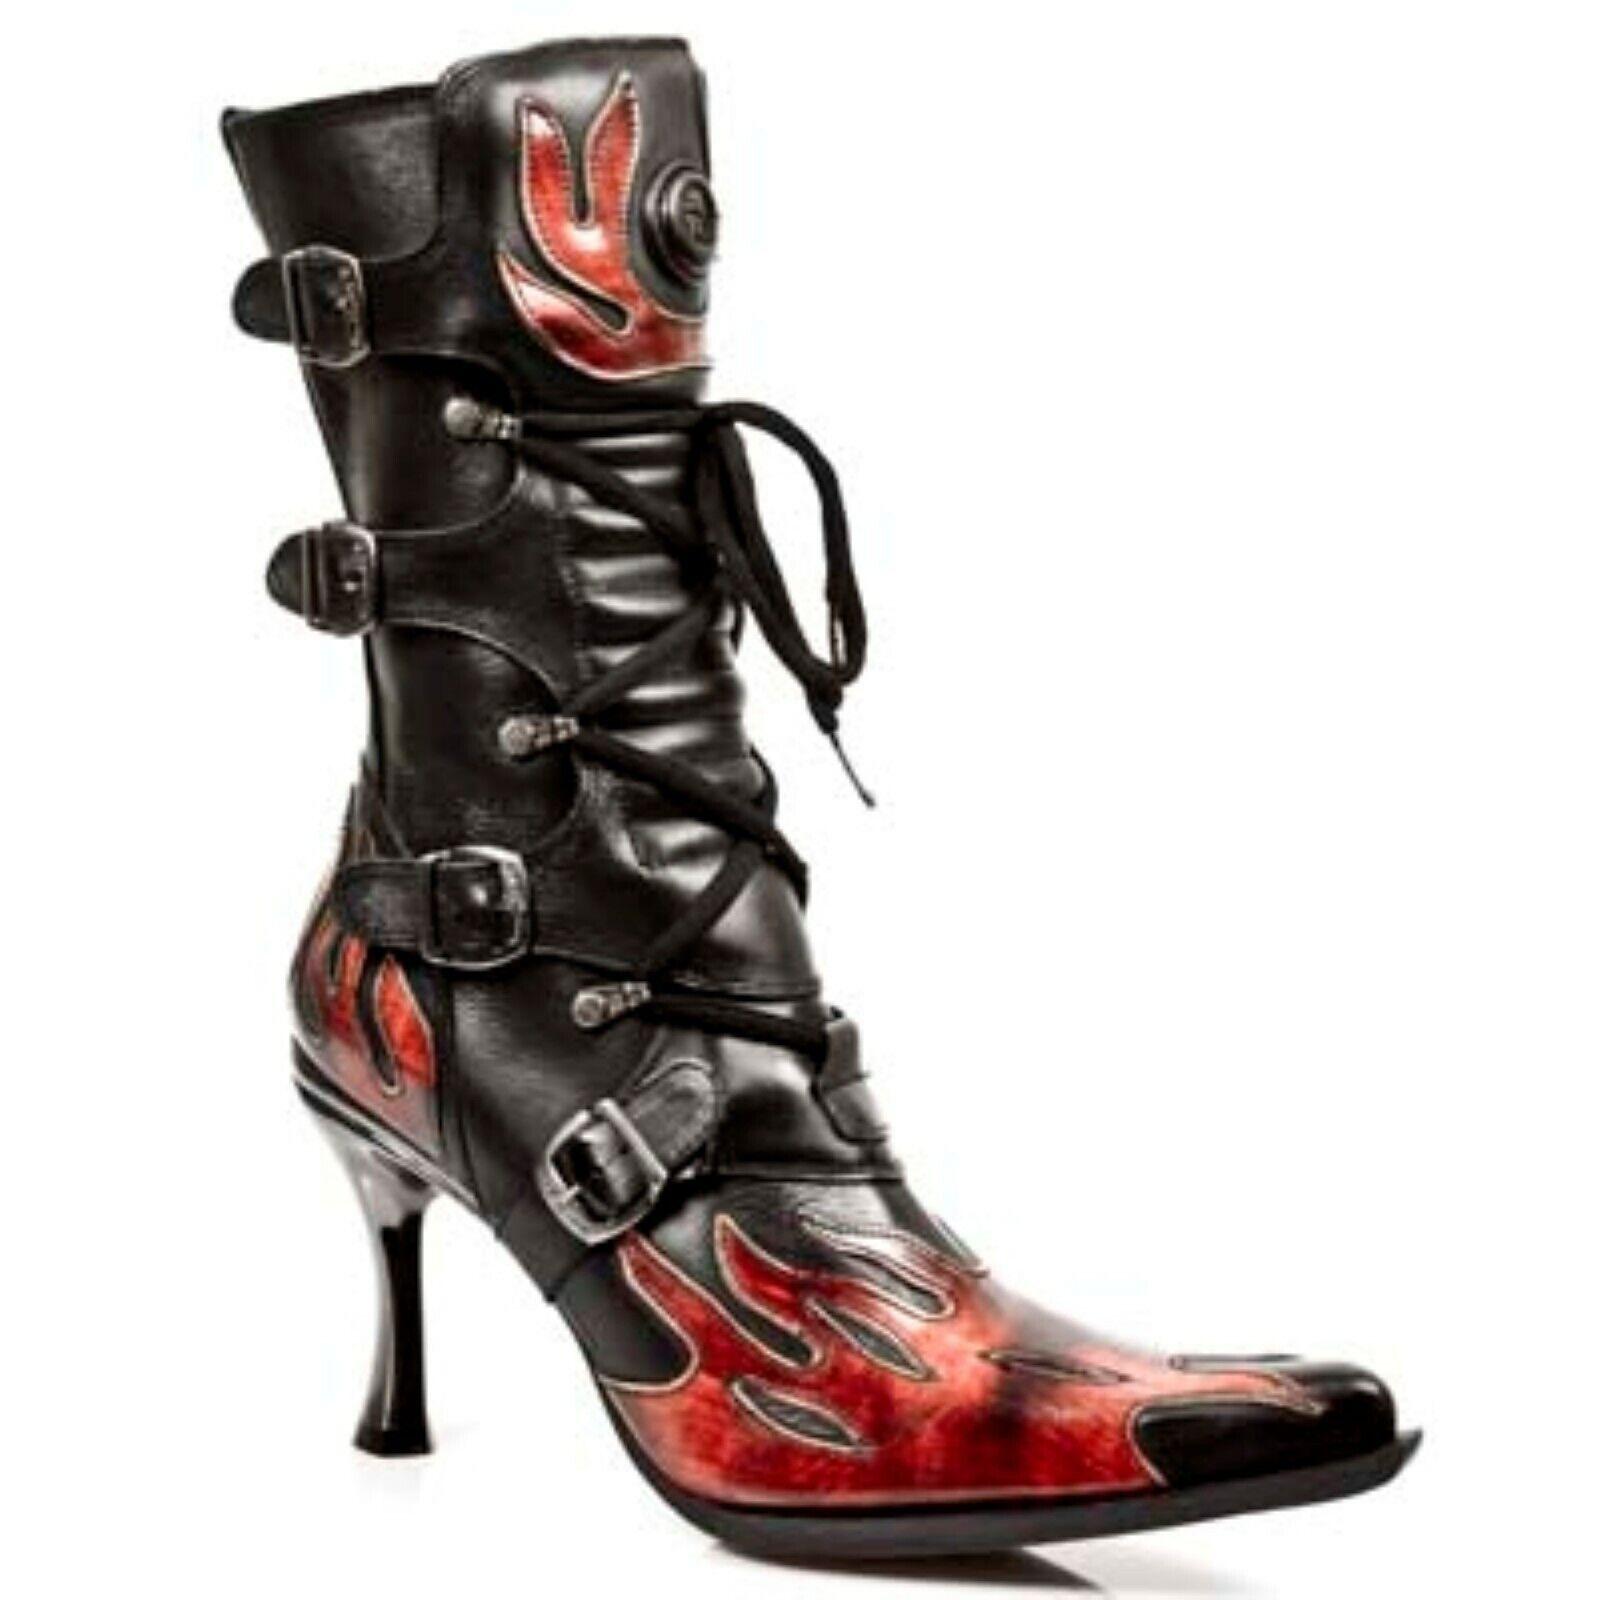 New Rock Malicia 9591-c10 Damen Schwarz Leder Rot Flamme Hoher Absatz Punk